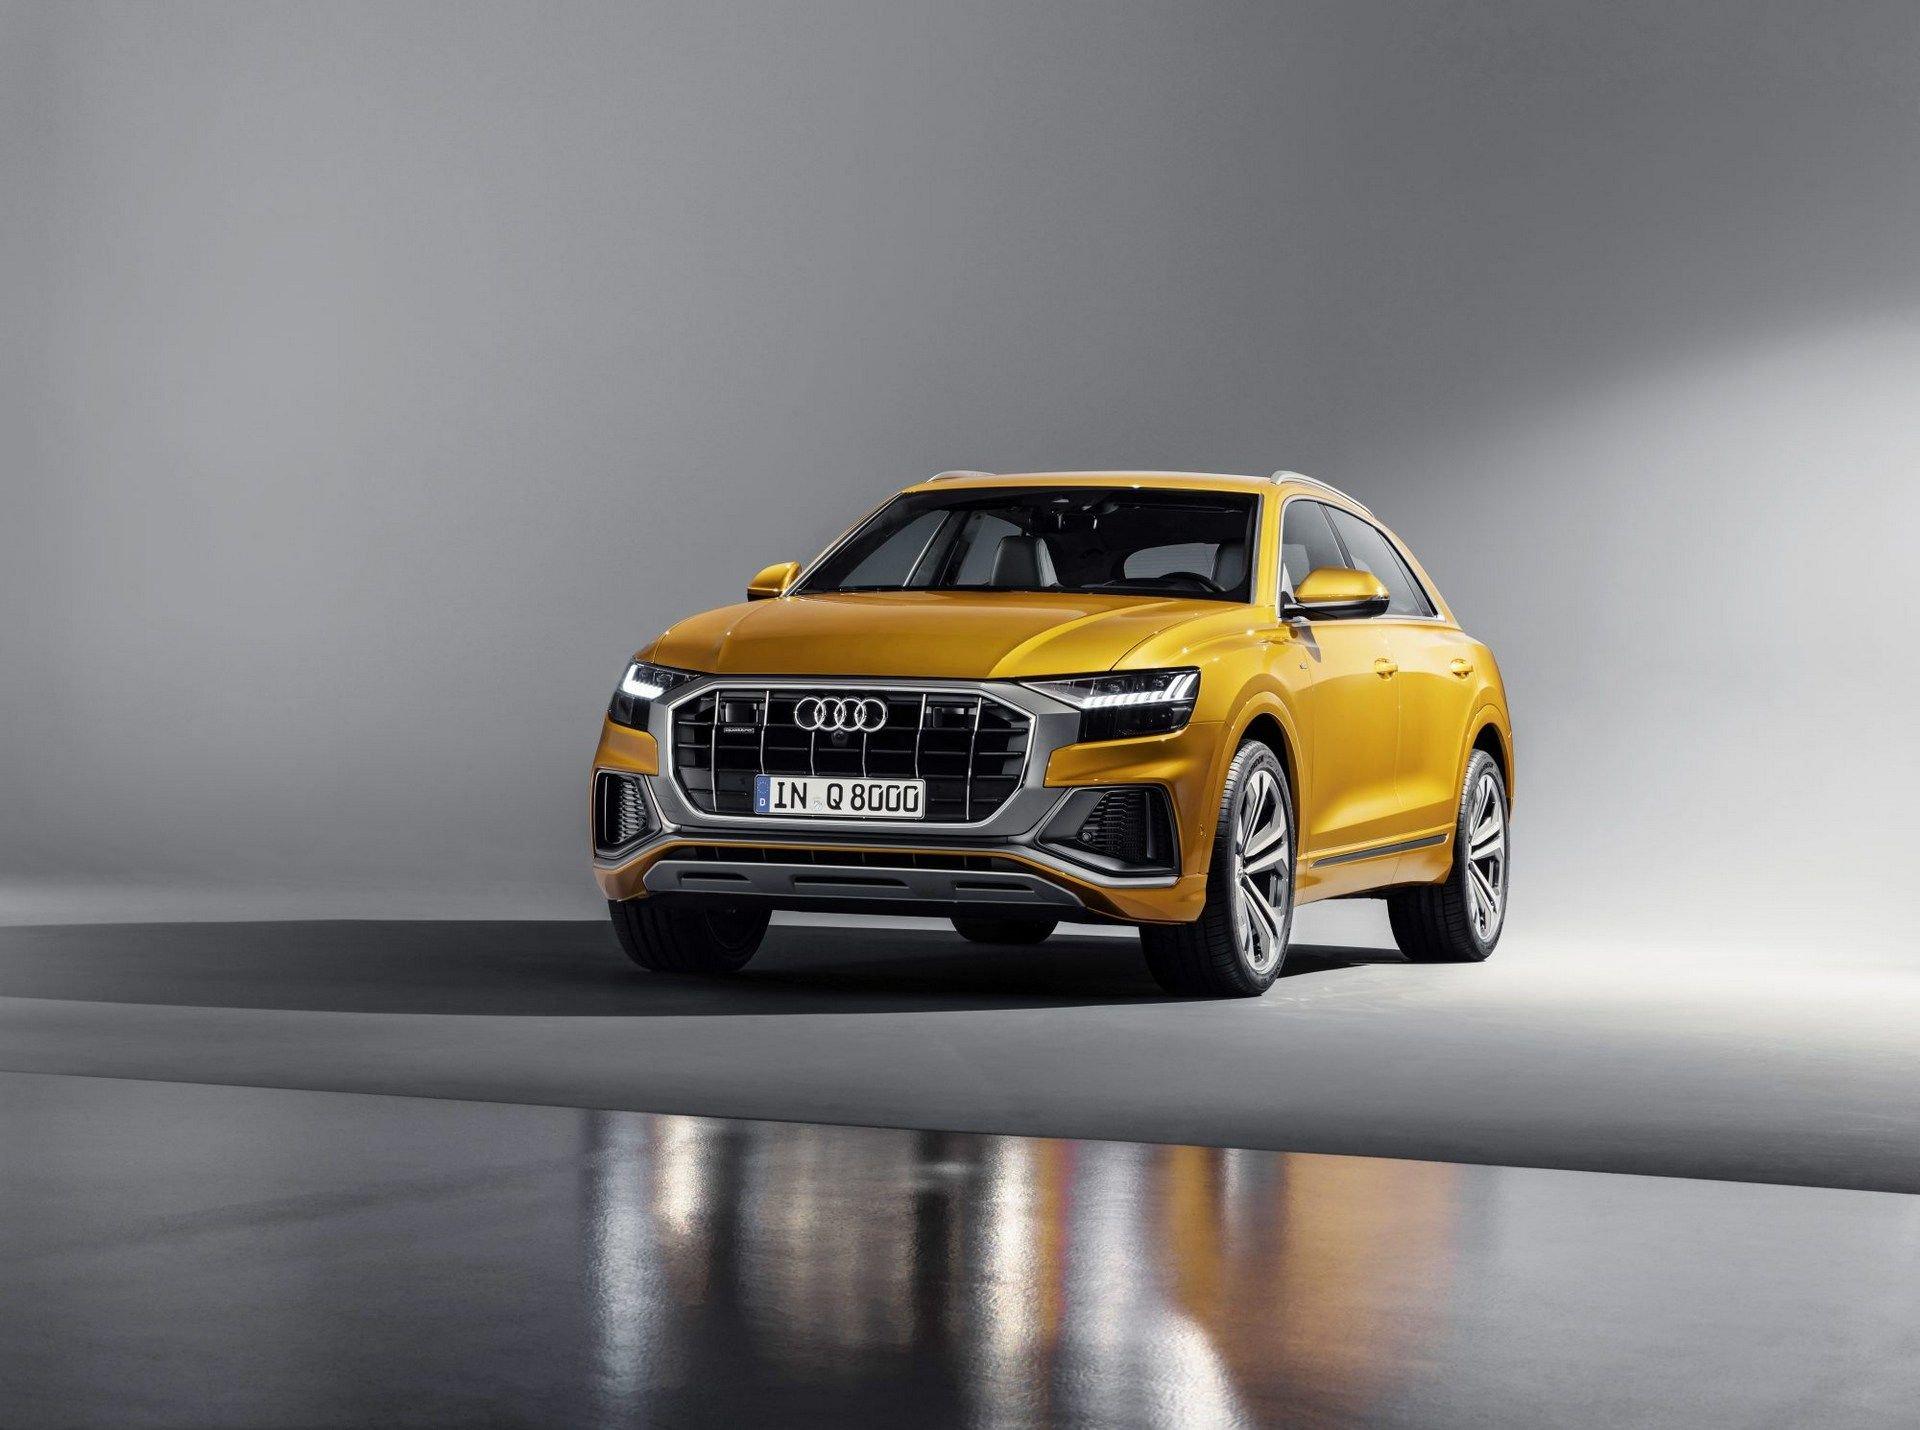 Audi Q8 2018 First Photos (9)